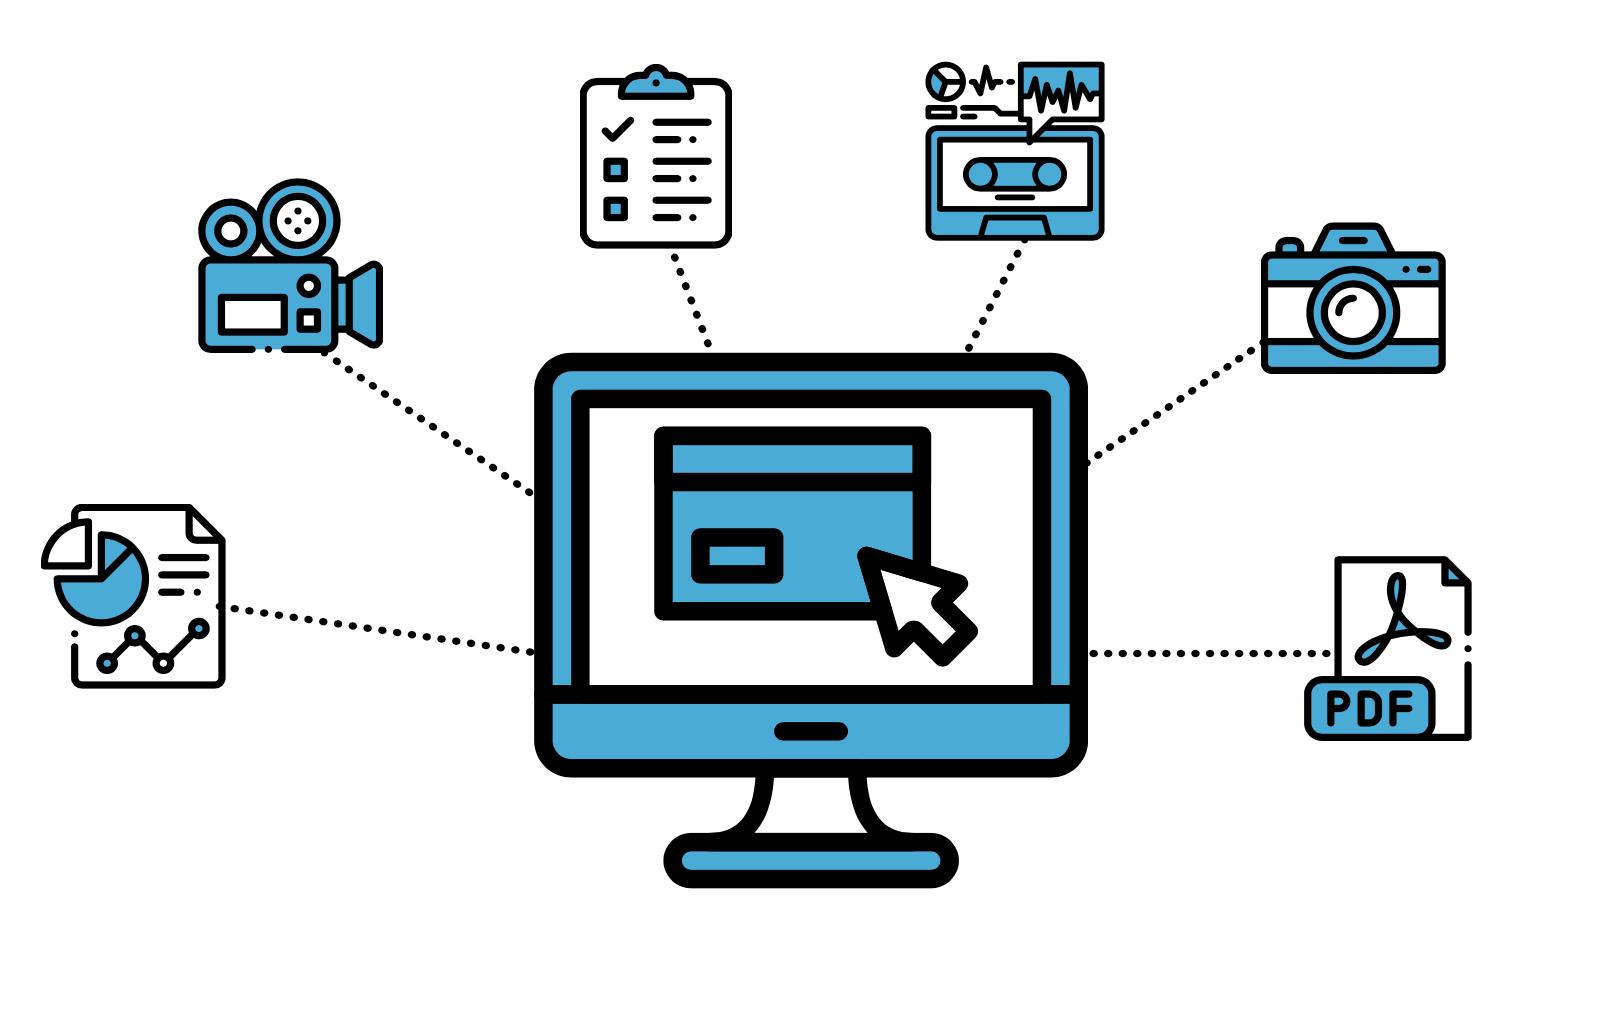 Digital Asset Management (DAM) System Infographic